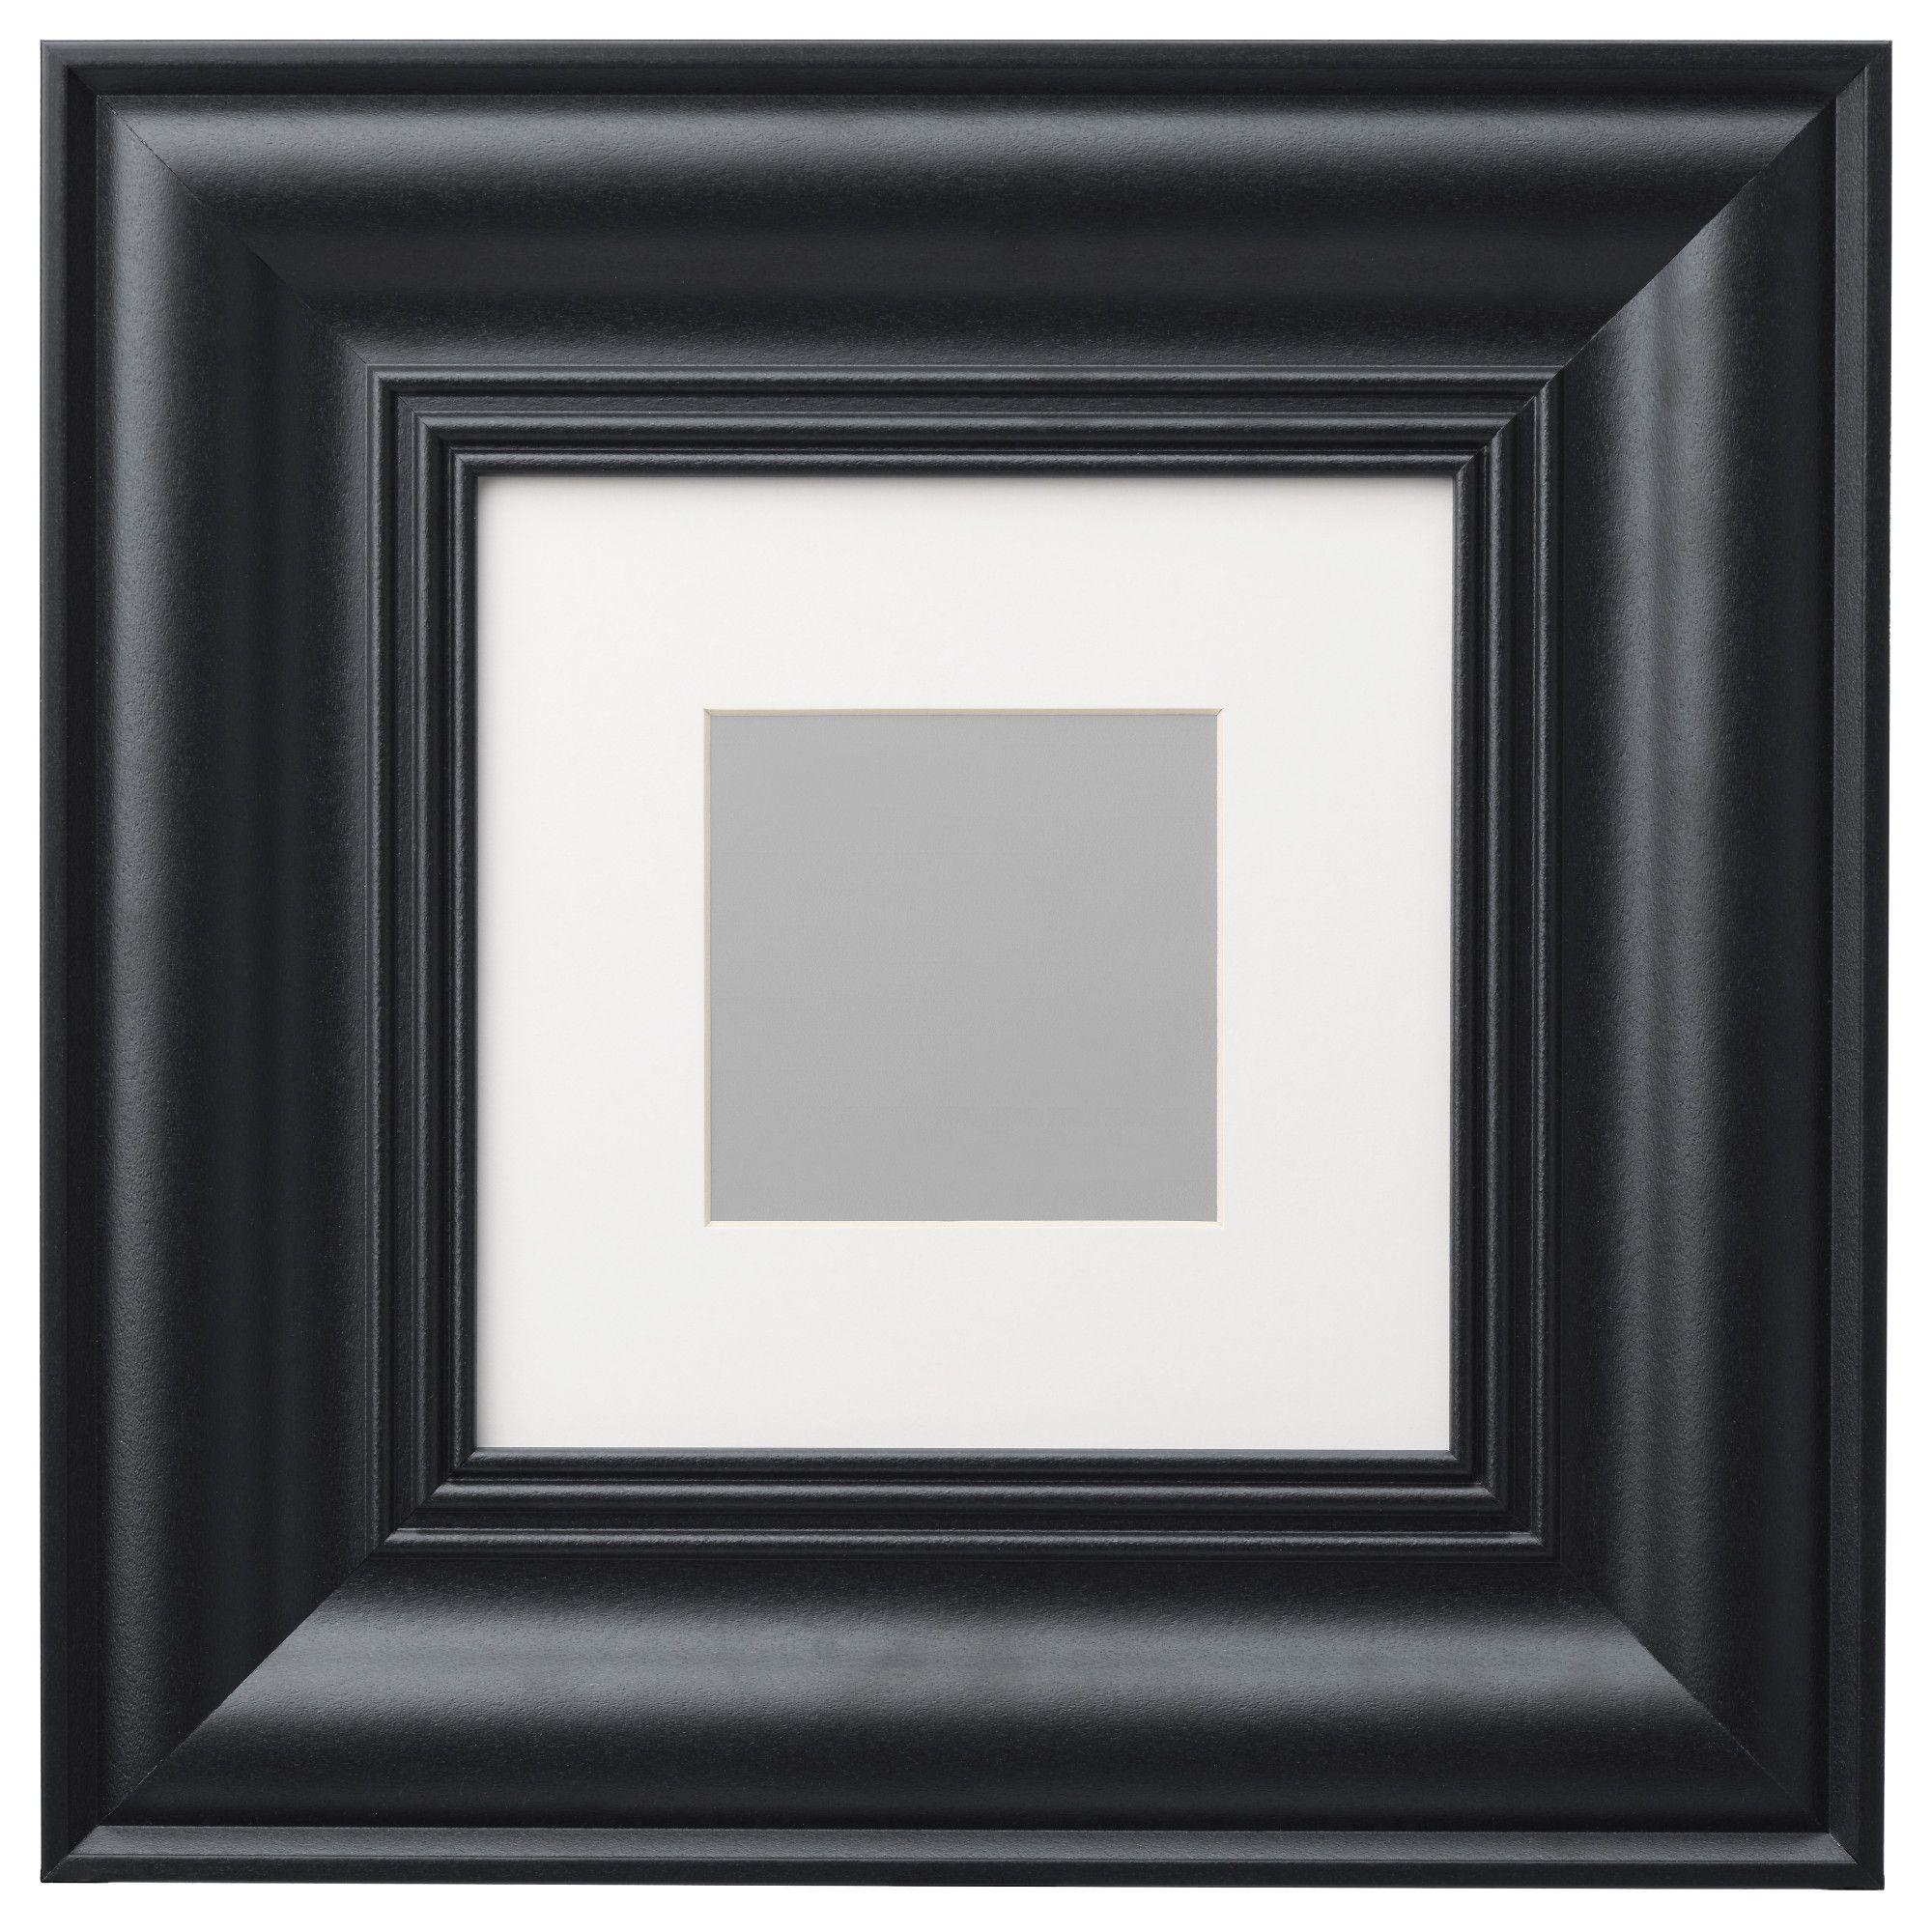 SKATTEBY Frame, black | ikea | Pinterest | Frame, Ikea and Picture ...